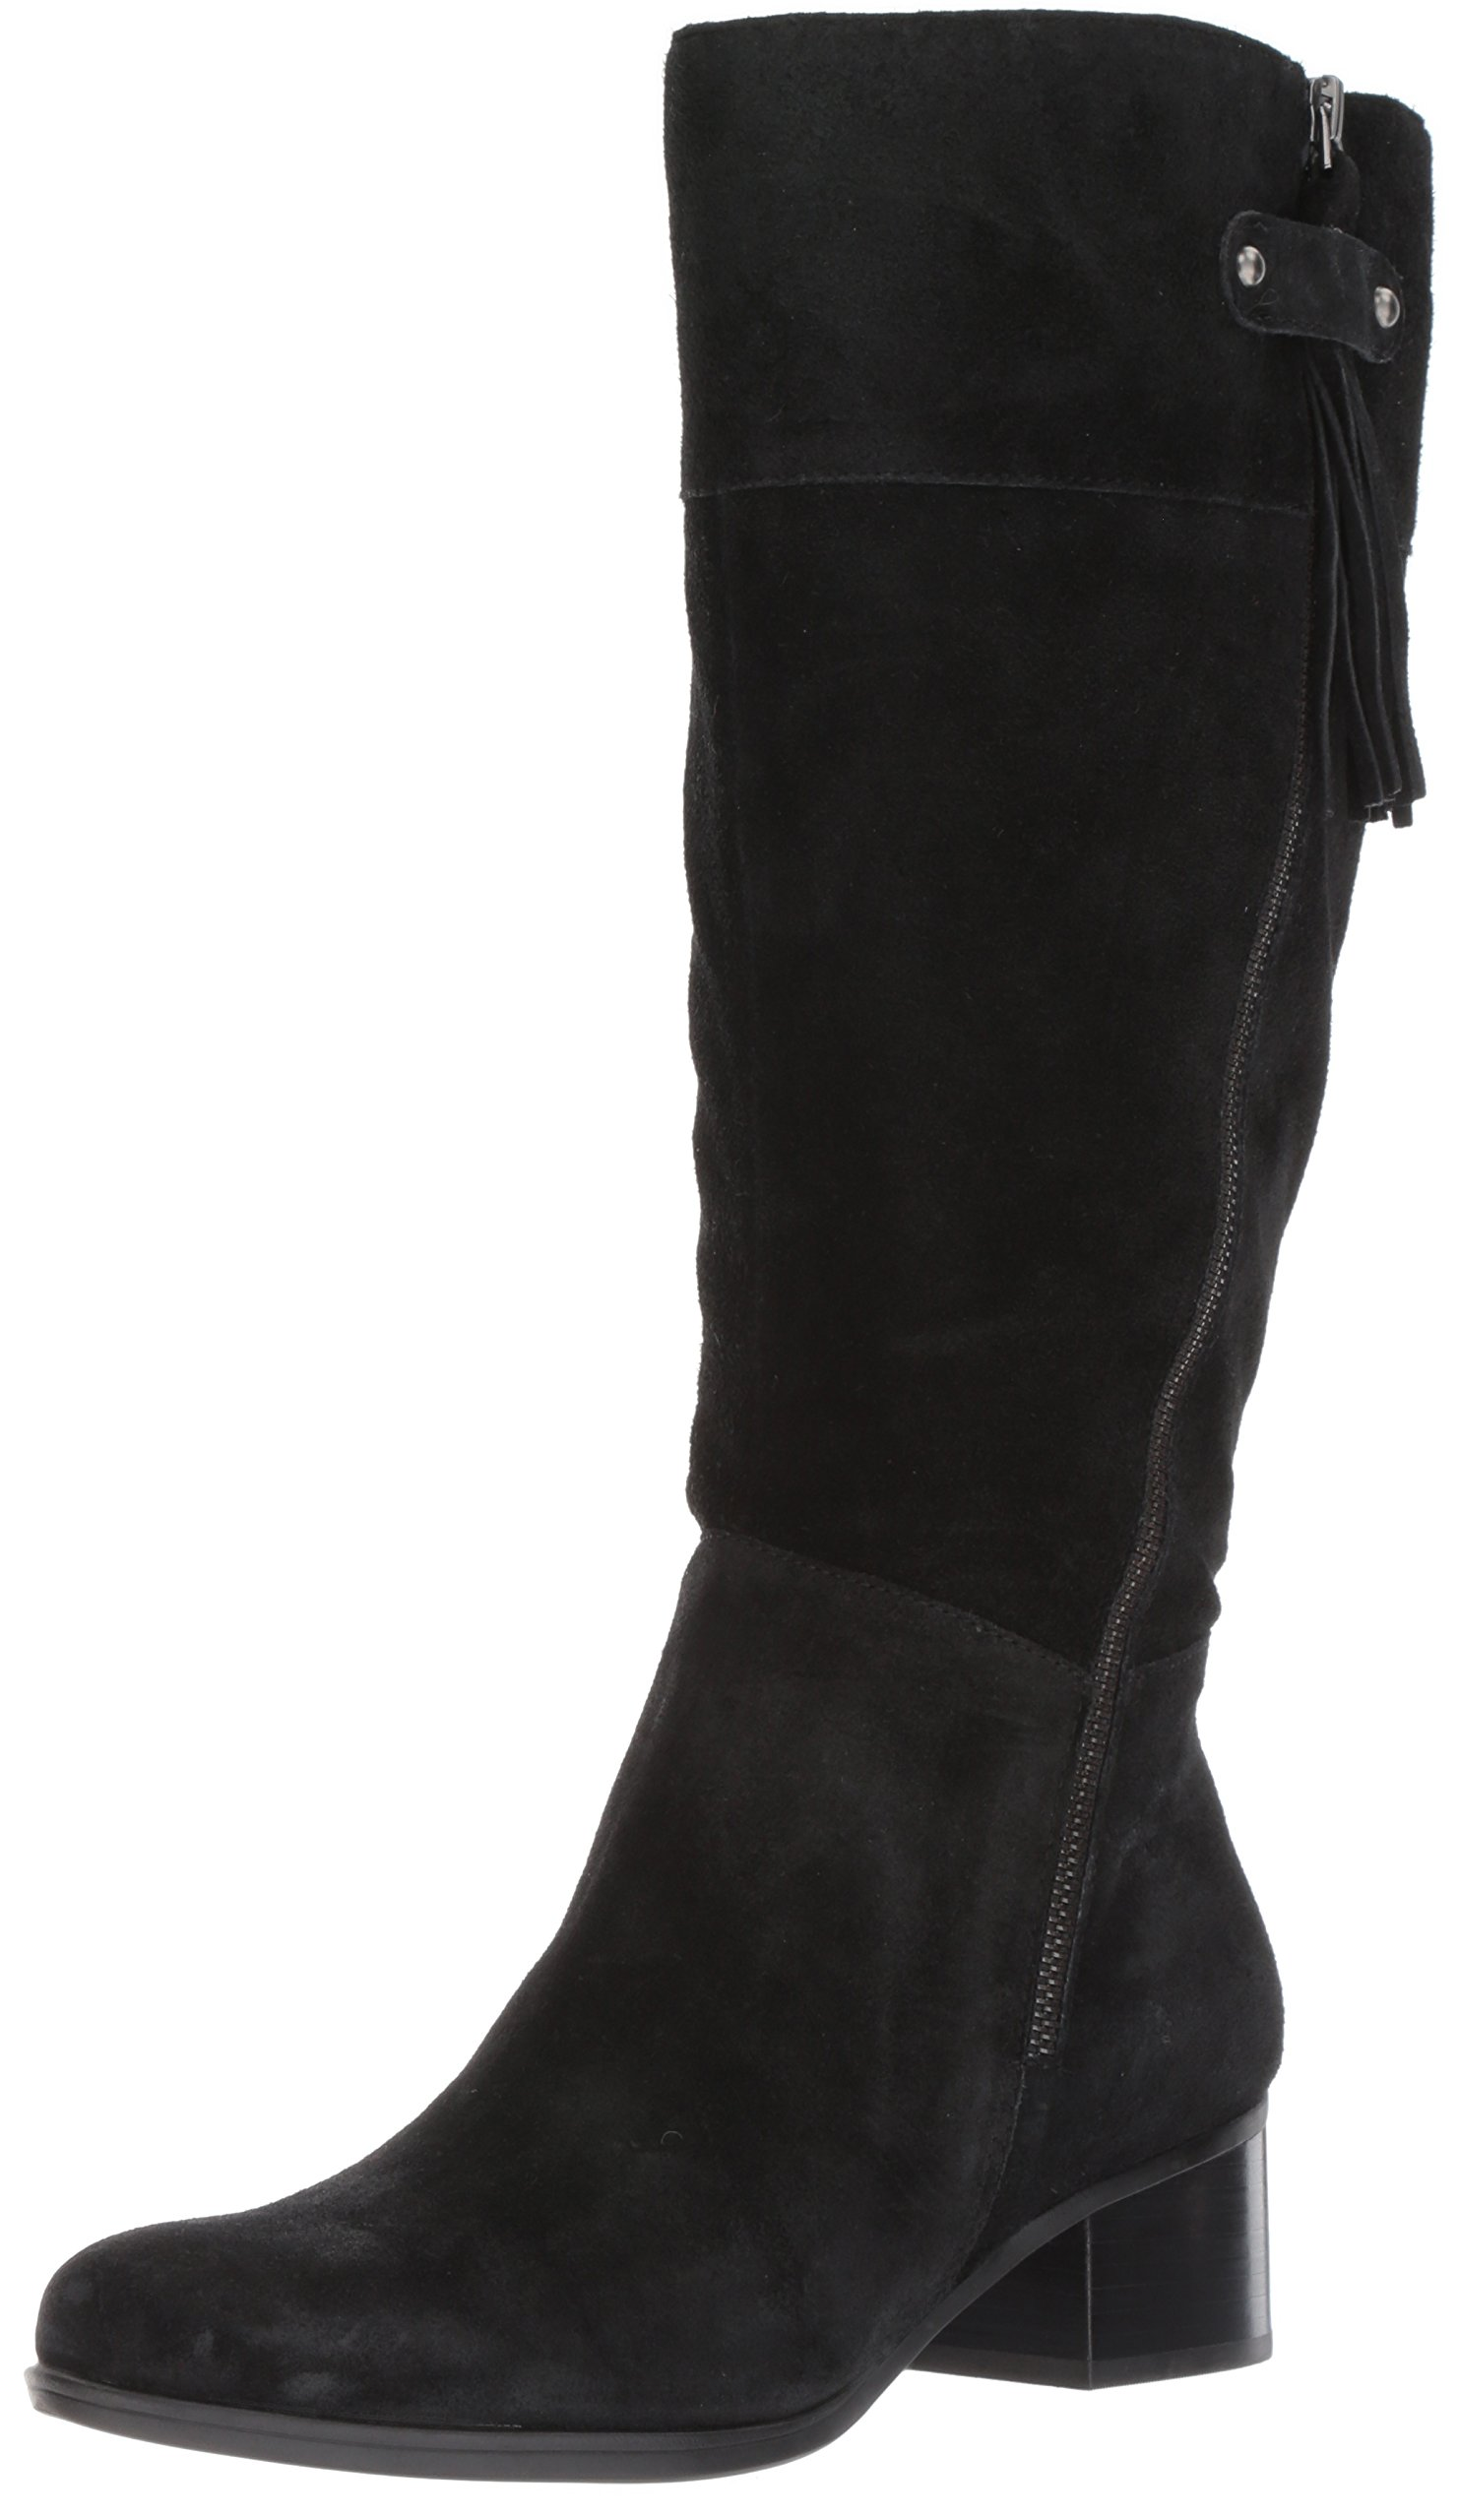 Naturalizer Women's Demi Wc Riding Boot, Black, 5.5 M US